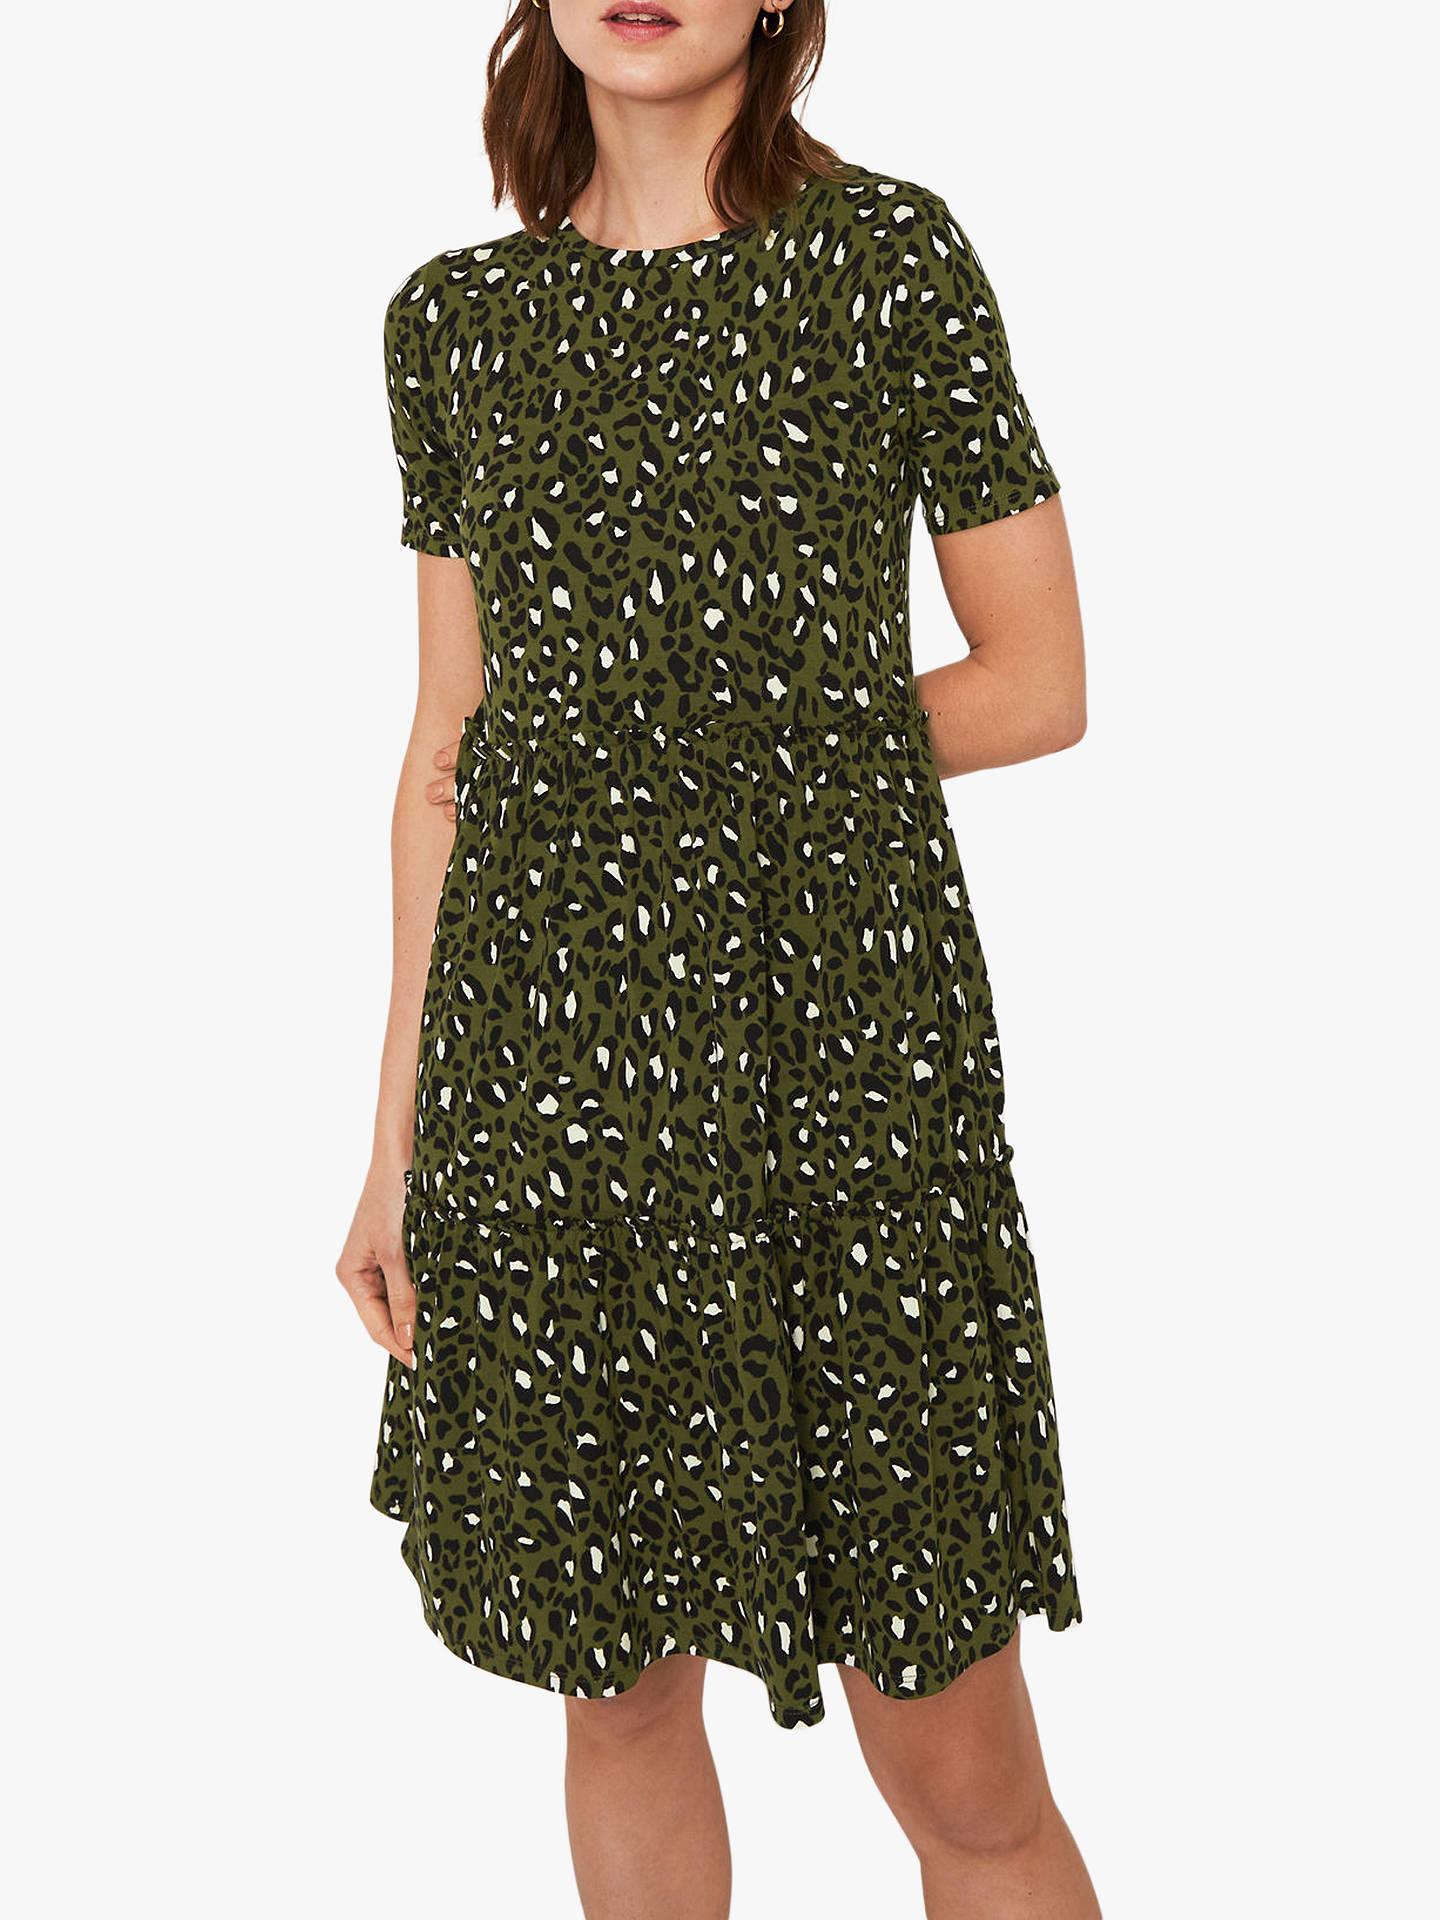 8e15ce33c82b Buy Warehouse Leopard Print T-Shirt Dress, Green Print, 8 Online at  johnlewis ...